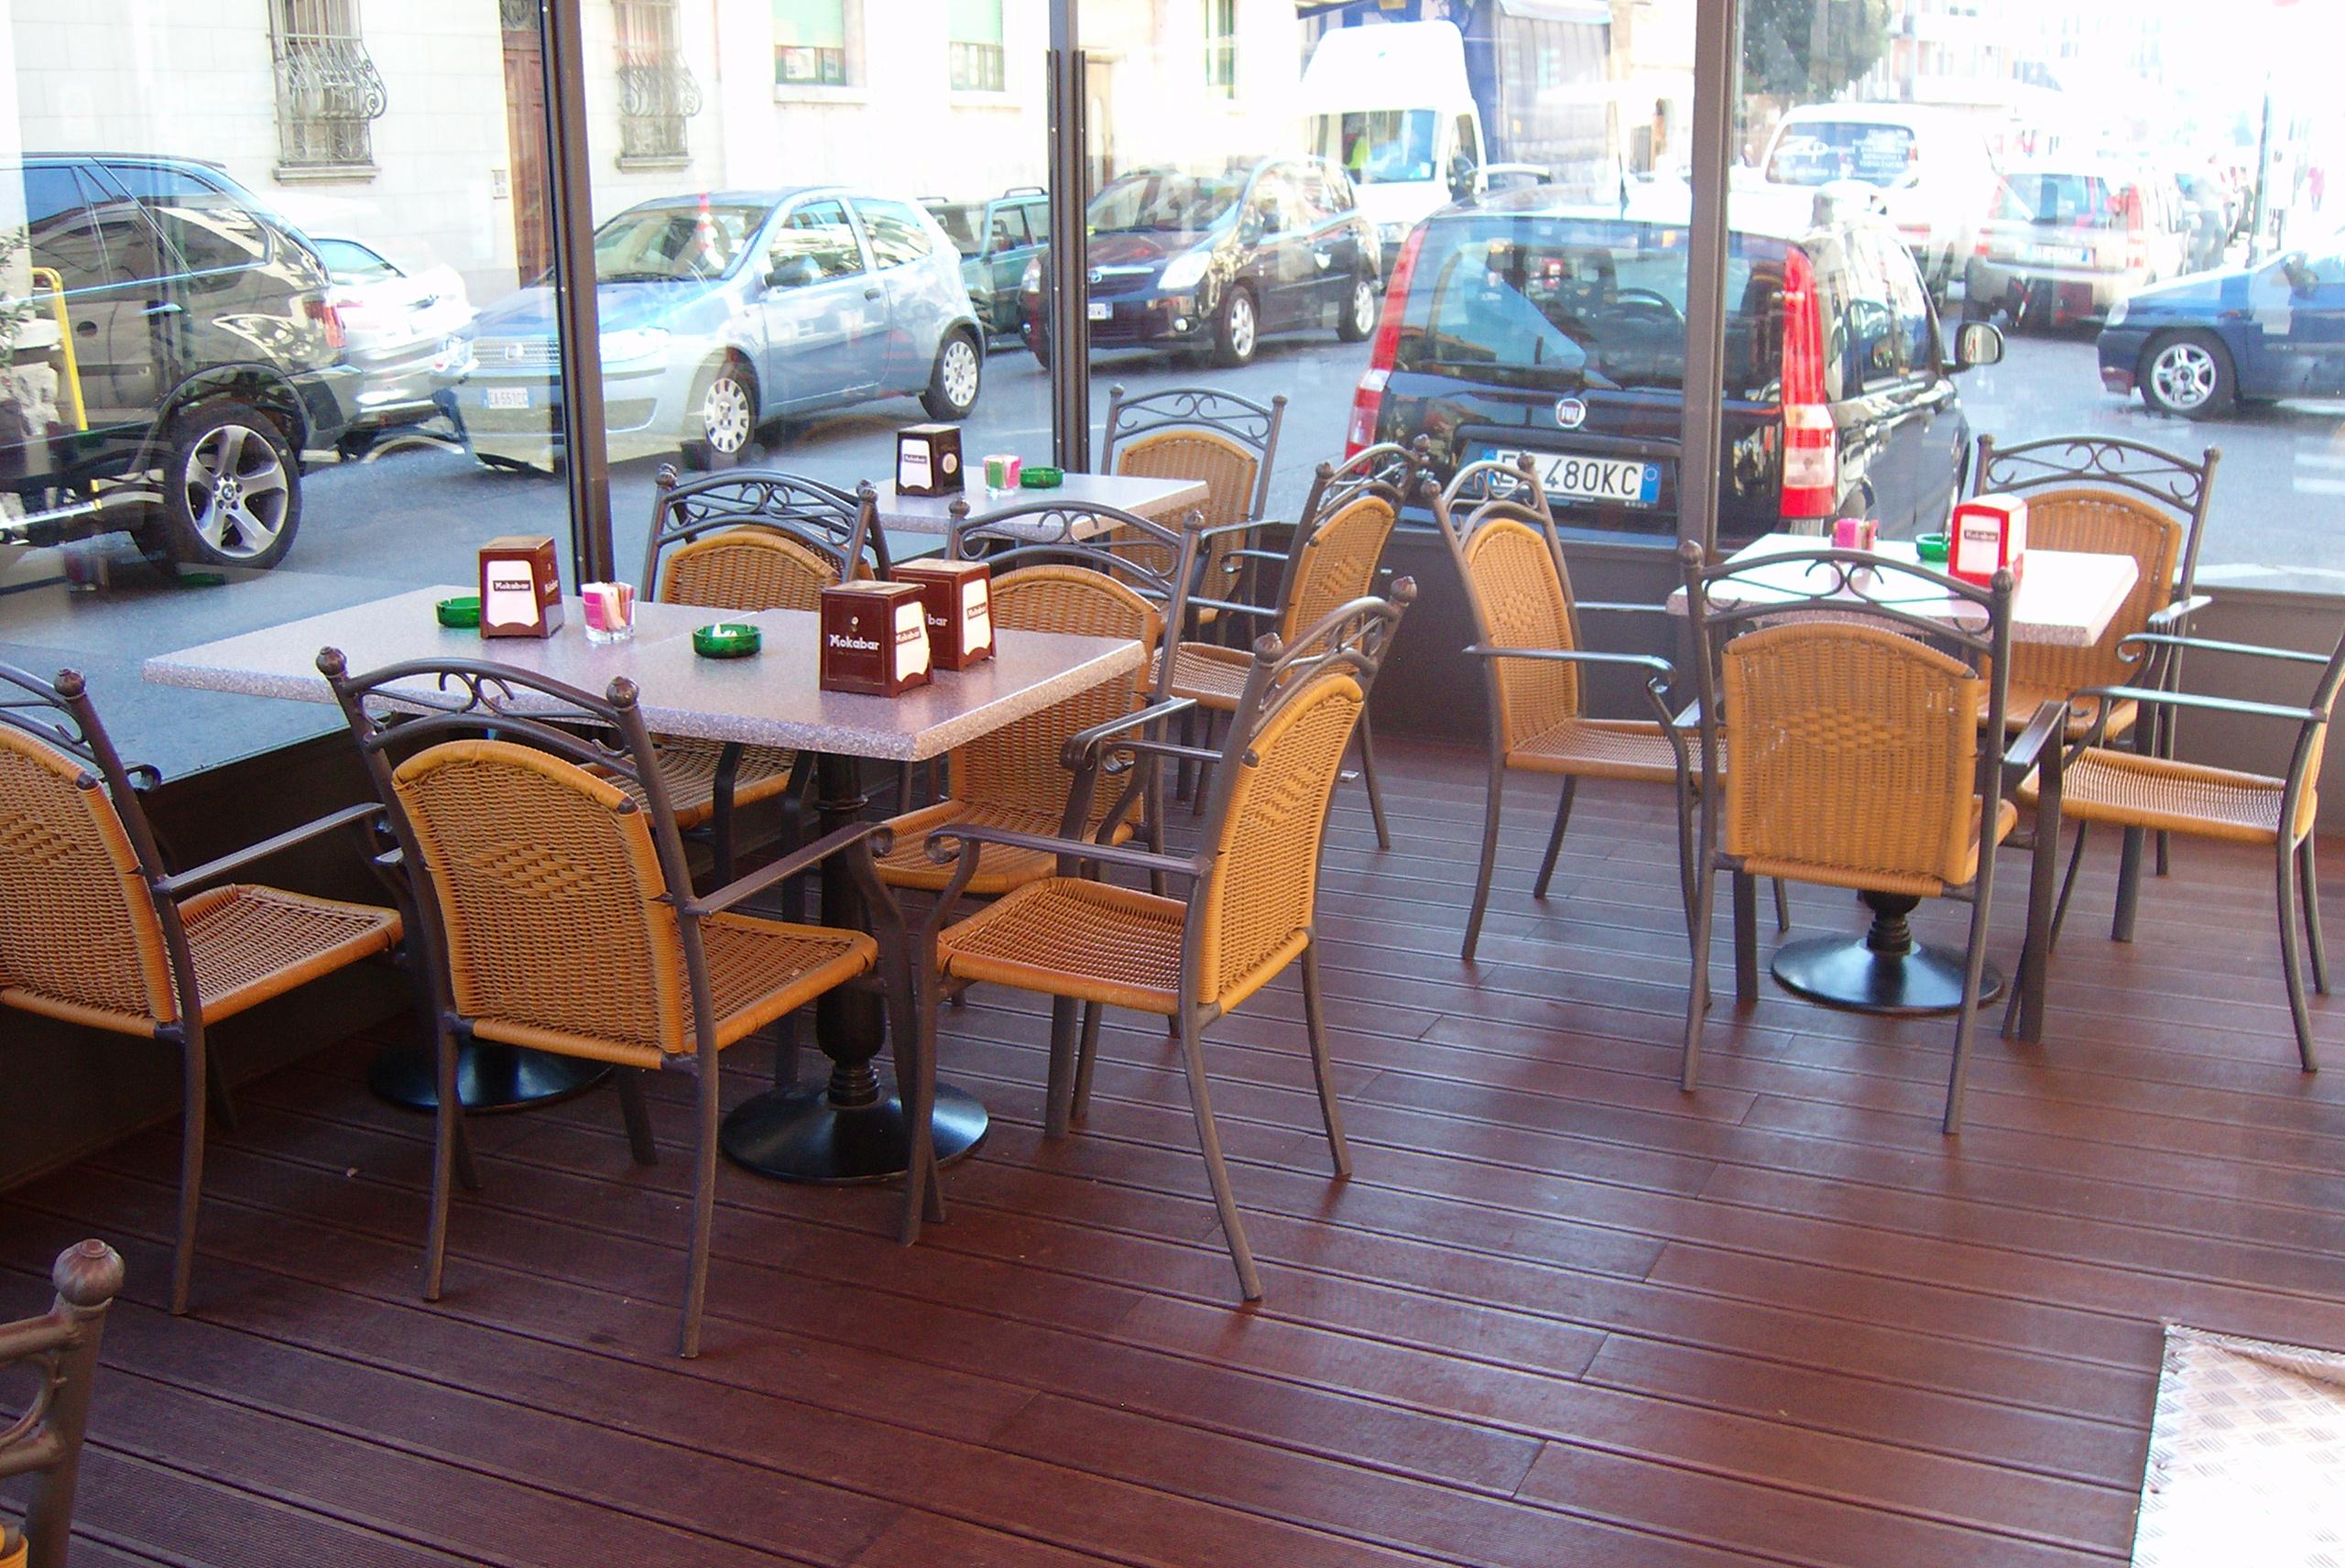 032 Merbau esterni - Dehors bar